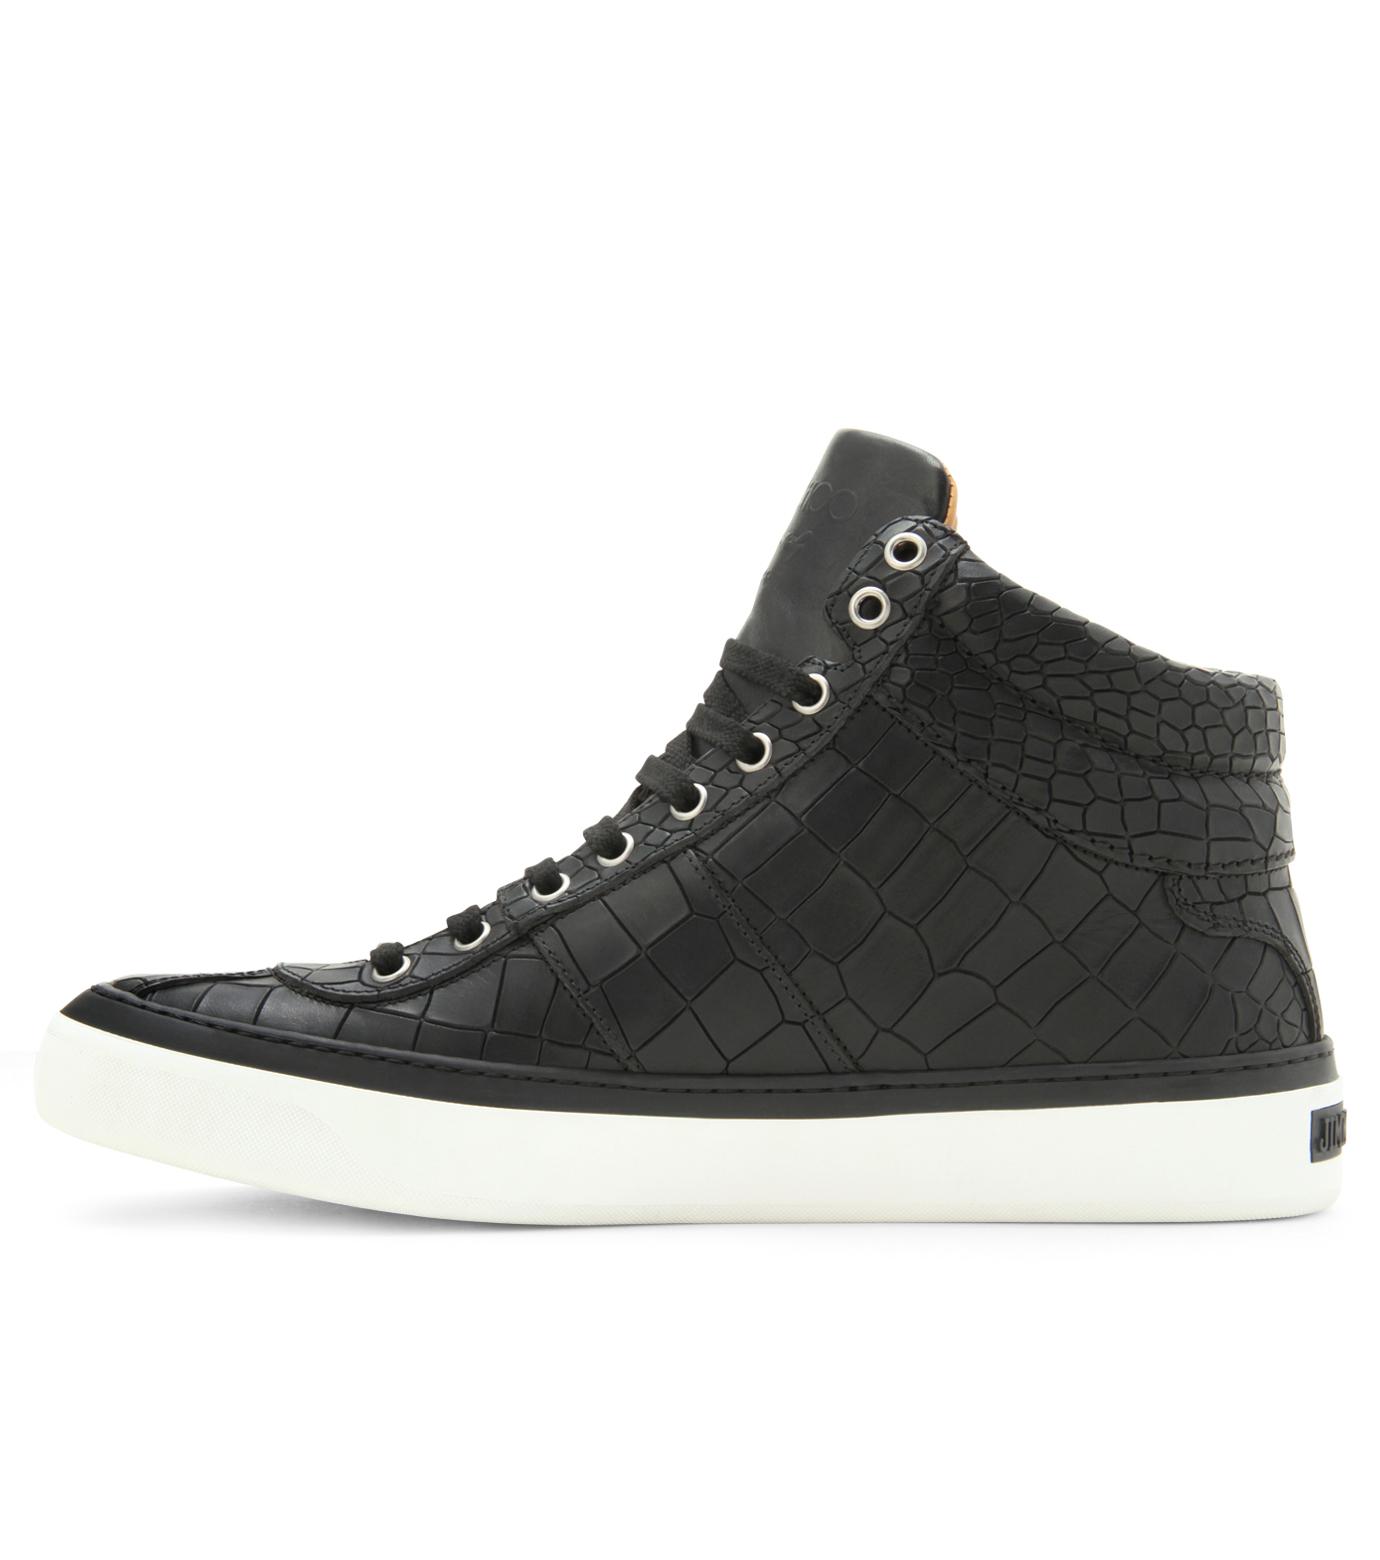 Jimmy Choo(ジミーチュウ)のCroco emboss sneaker-BLACK-BELGRAVI-CCL-13 拡大詳細画像2